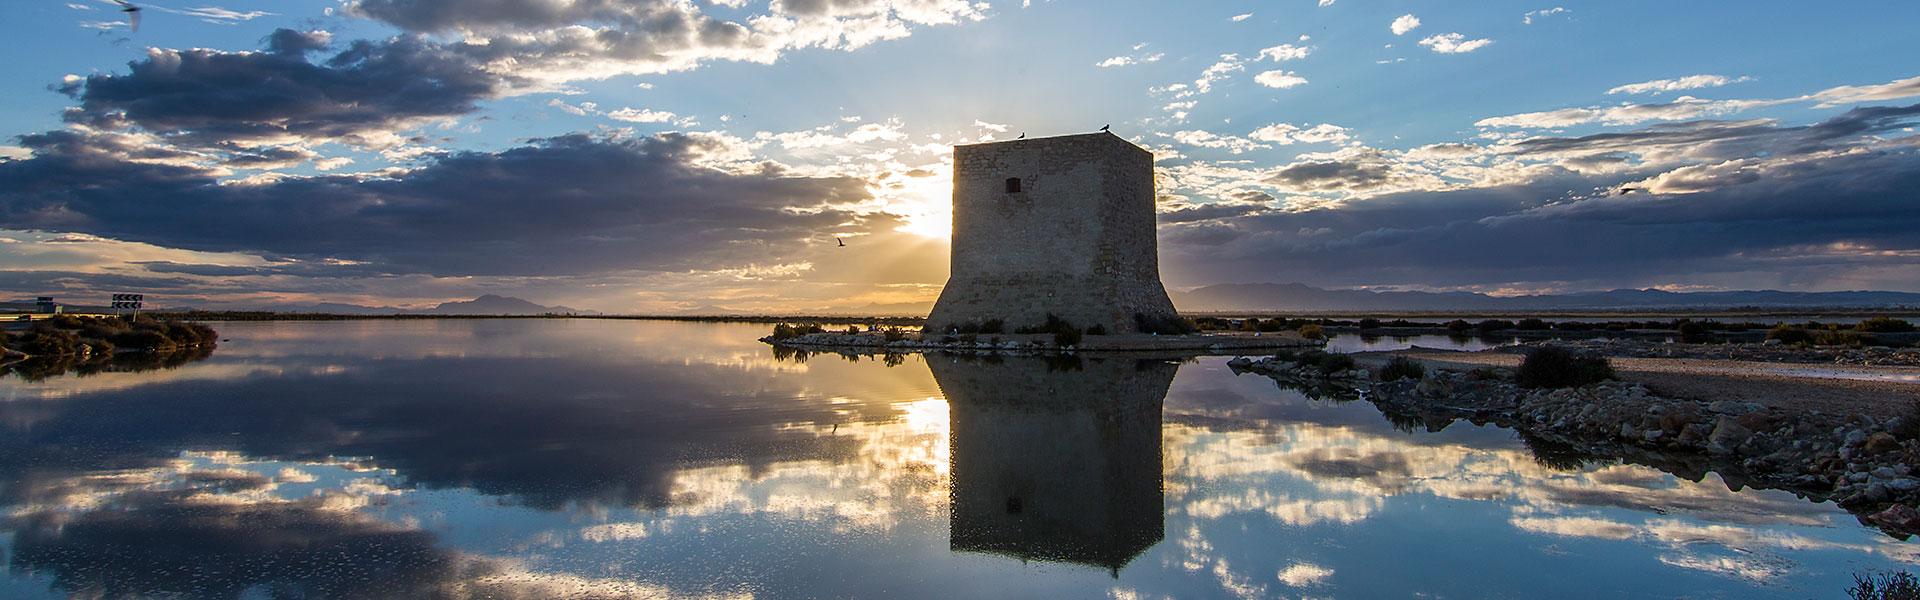 Venta de Obra - Torre Tamarit